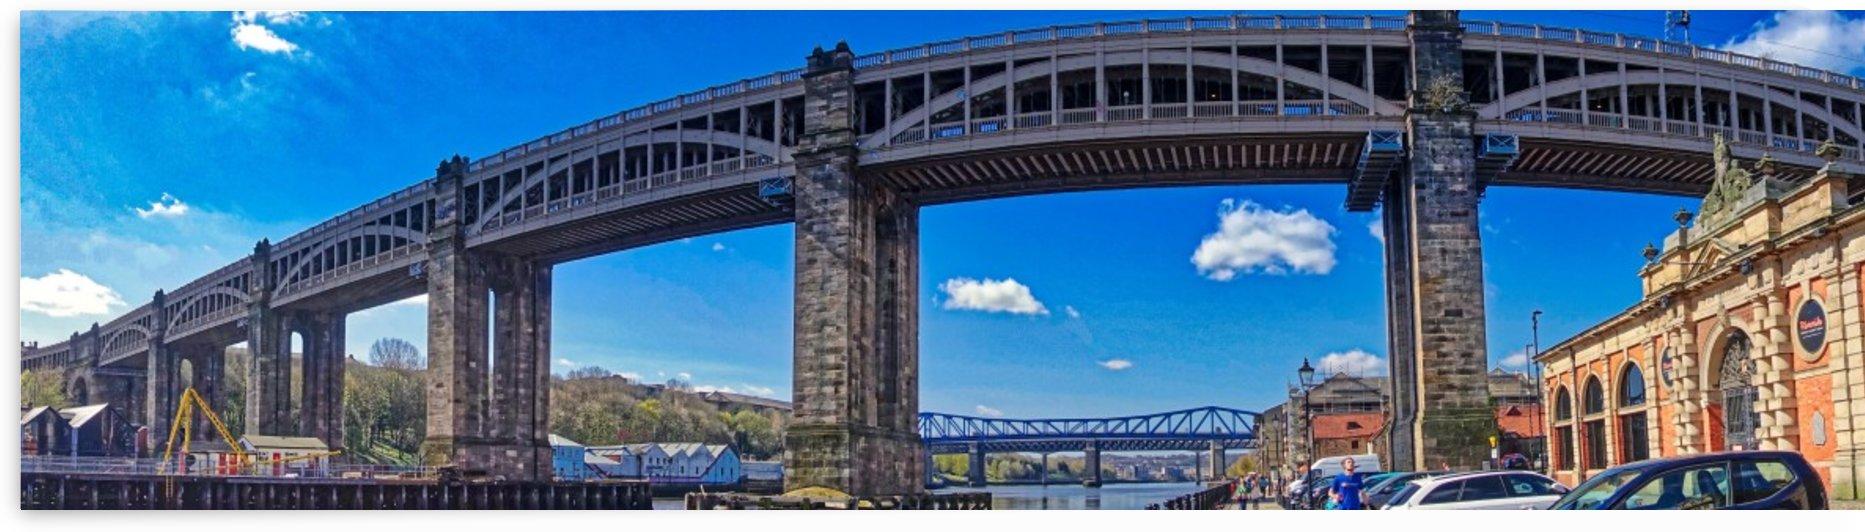 Newcastle railway bridge by Andy Jamieson